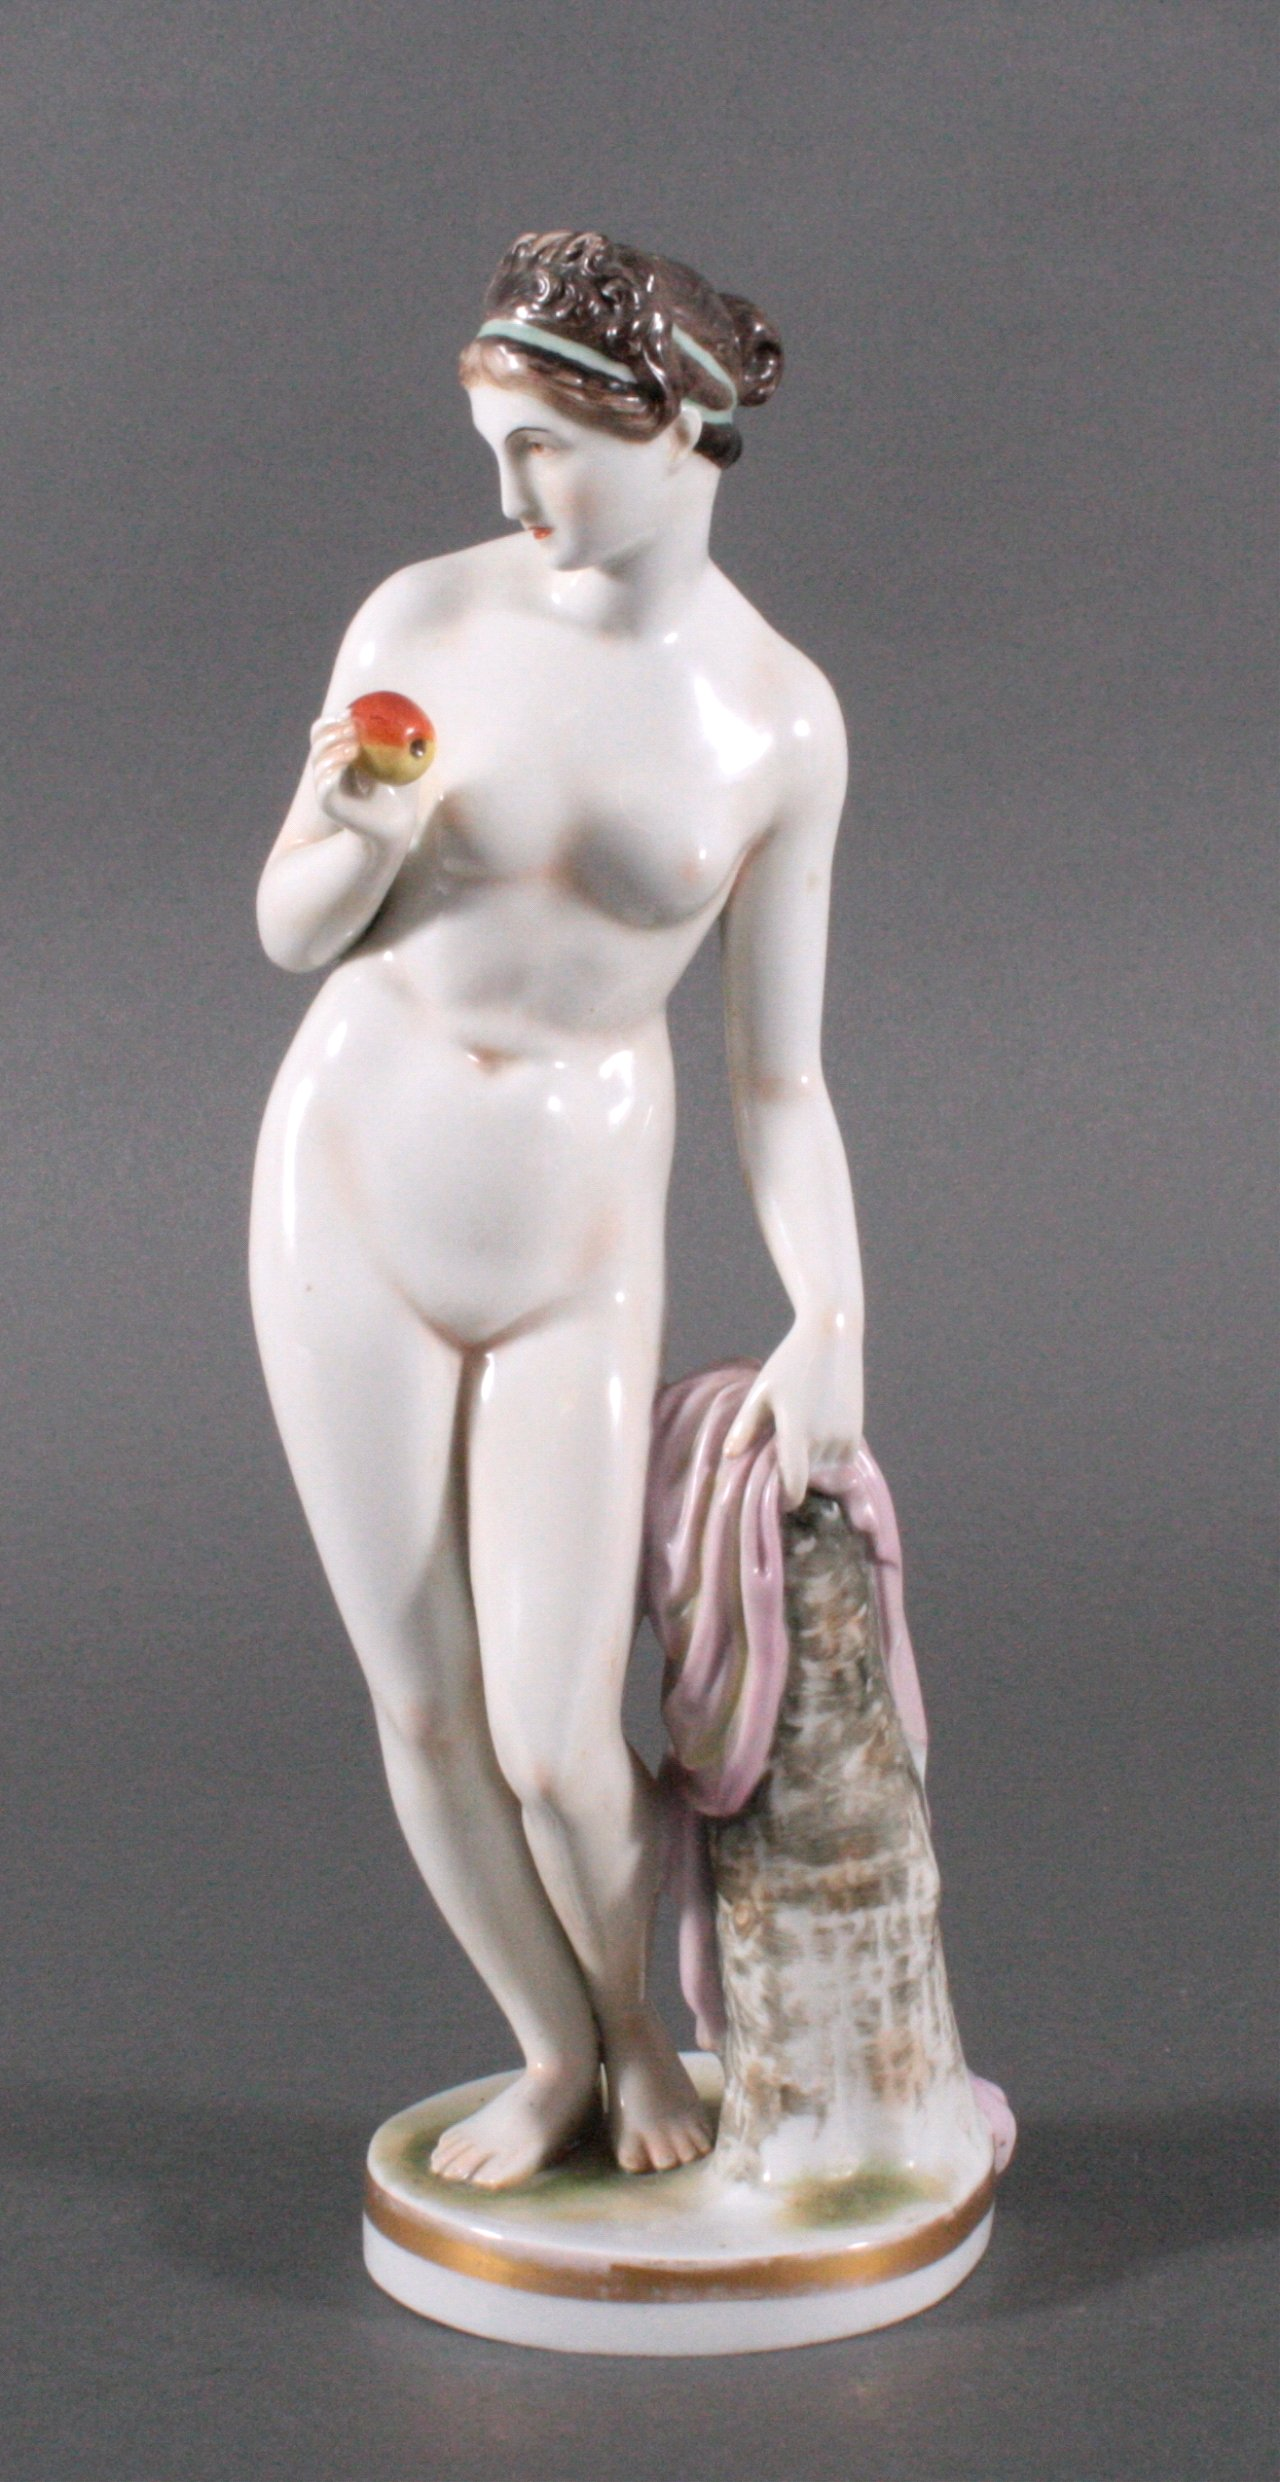 Porzellan-Skulptur, Aelteste Vokstedter